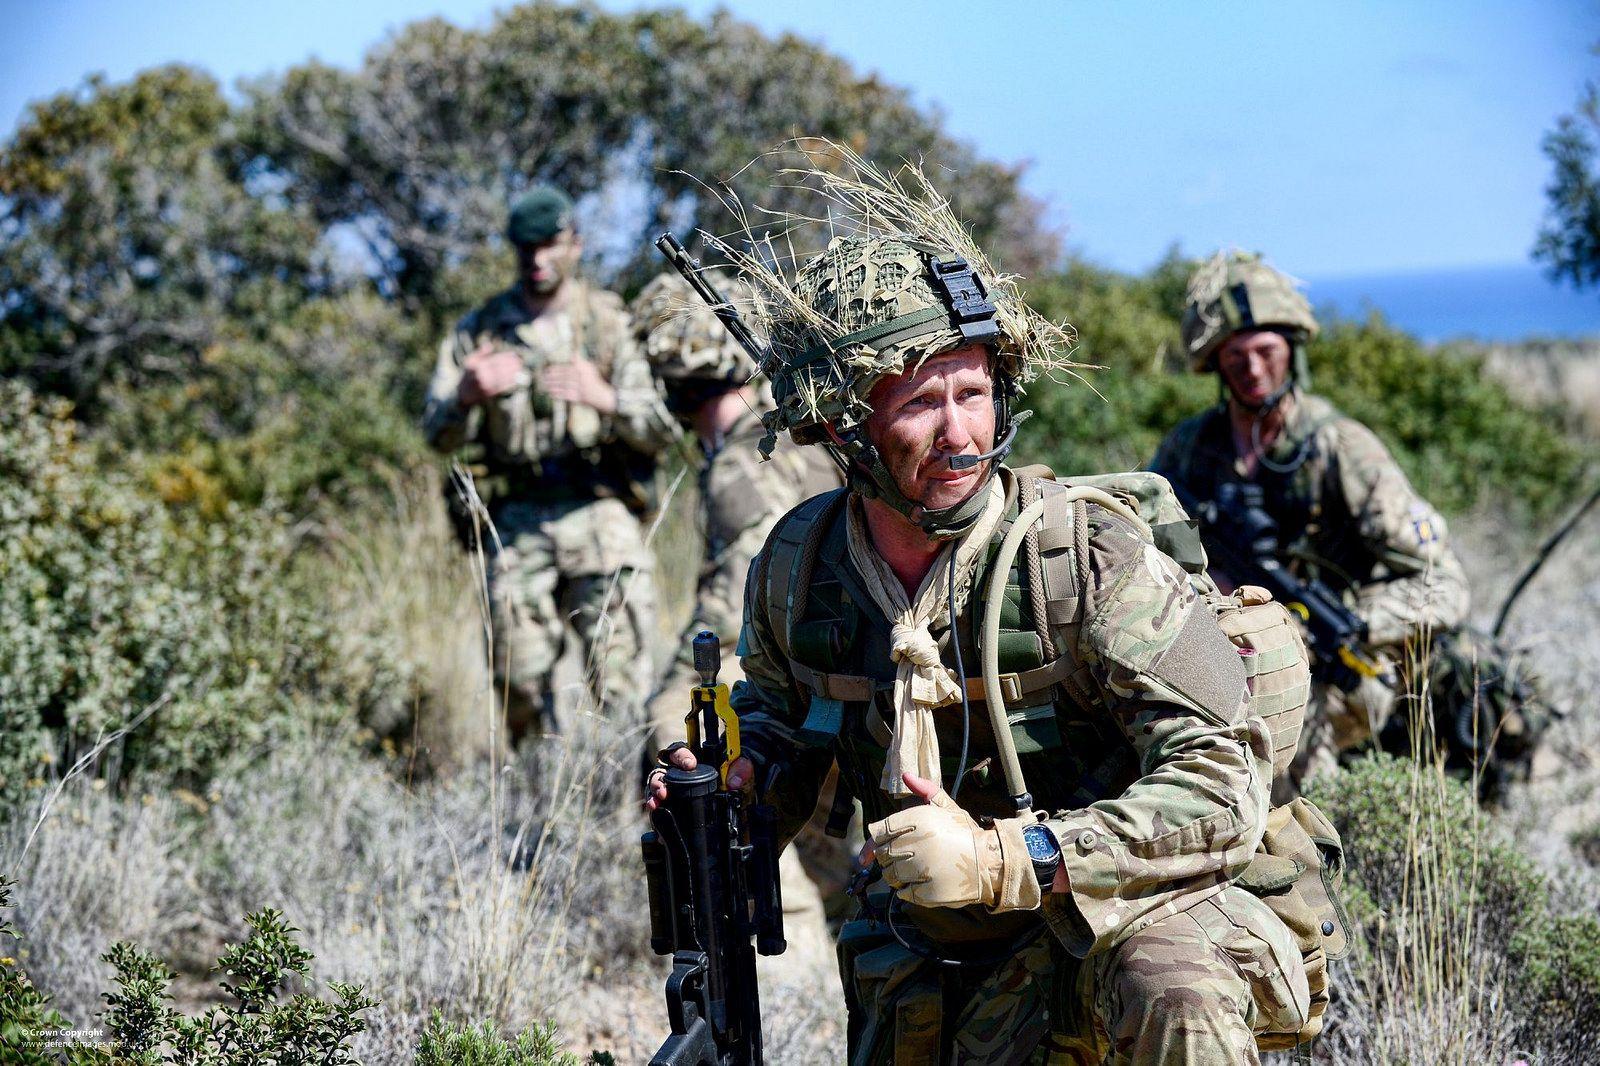 Британски војници током војне вежбе на Кипру, 30. април 2014. (Фото: Cpl Si Longworth RLC/flickr.com)